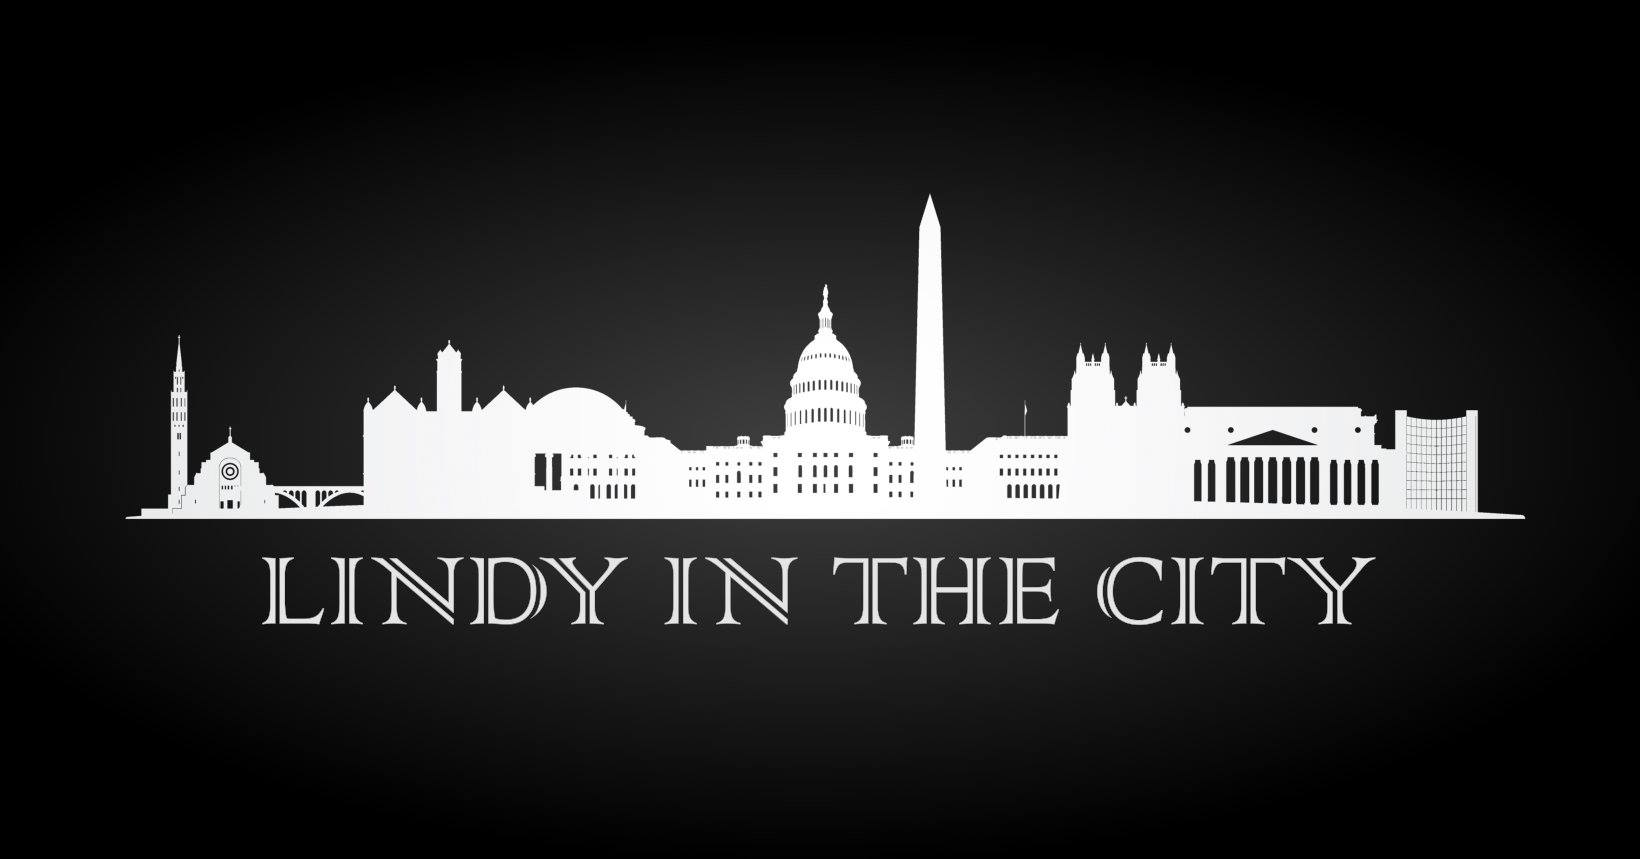 LindyInTheCity.jpg